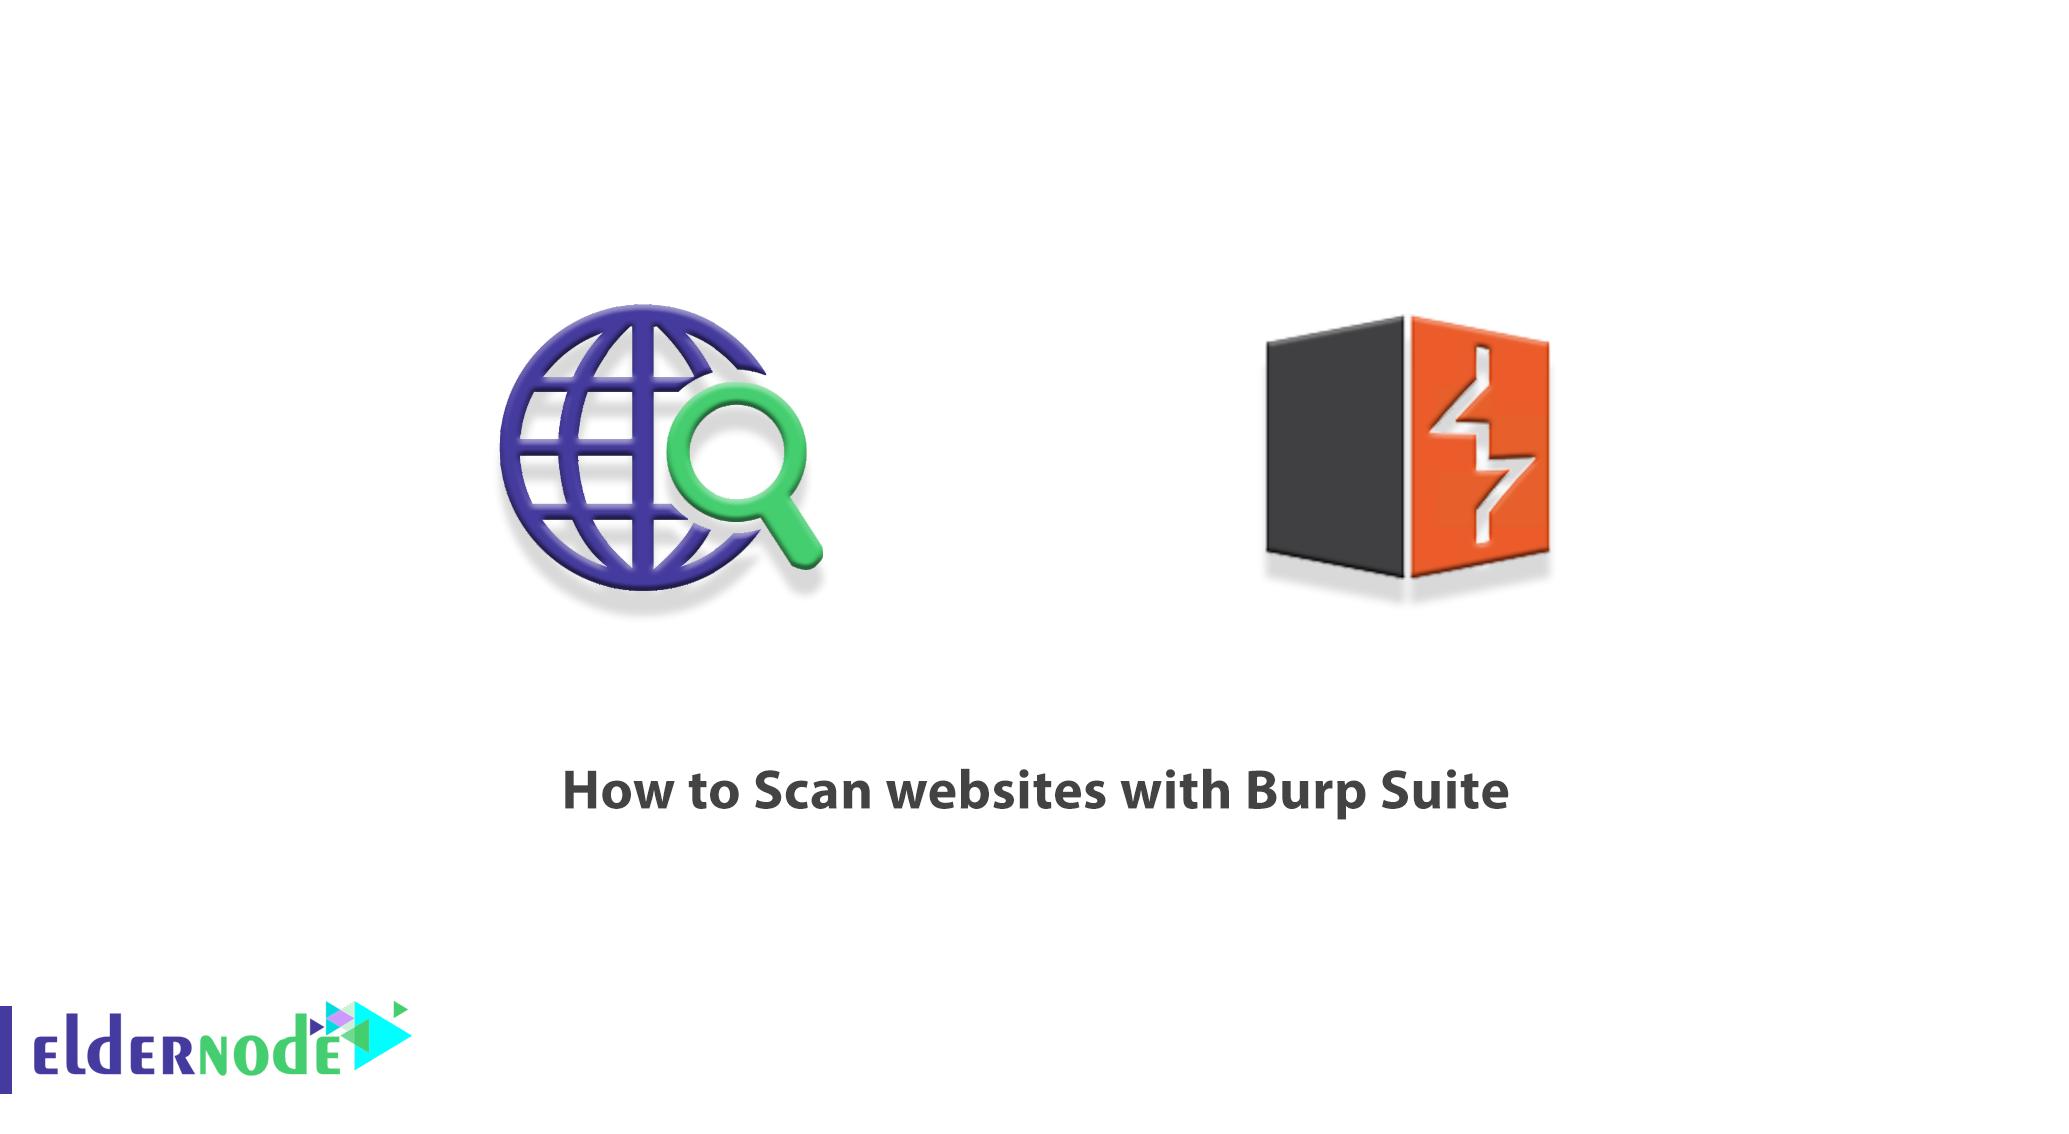 How to Scan websites with Burp Suite